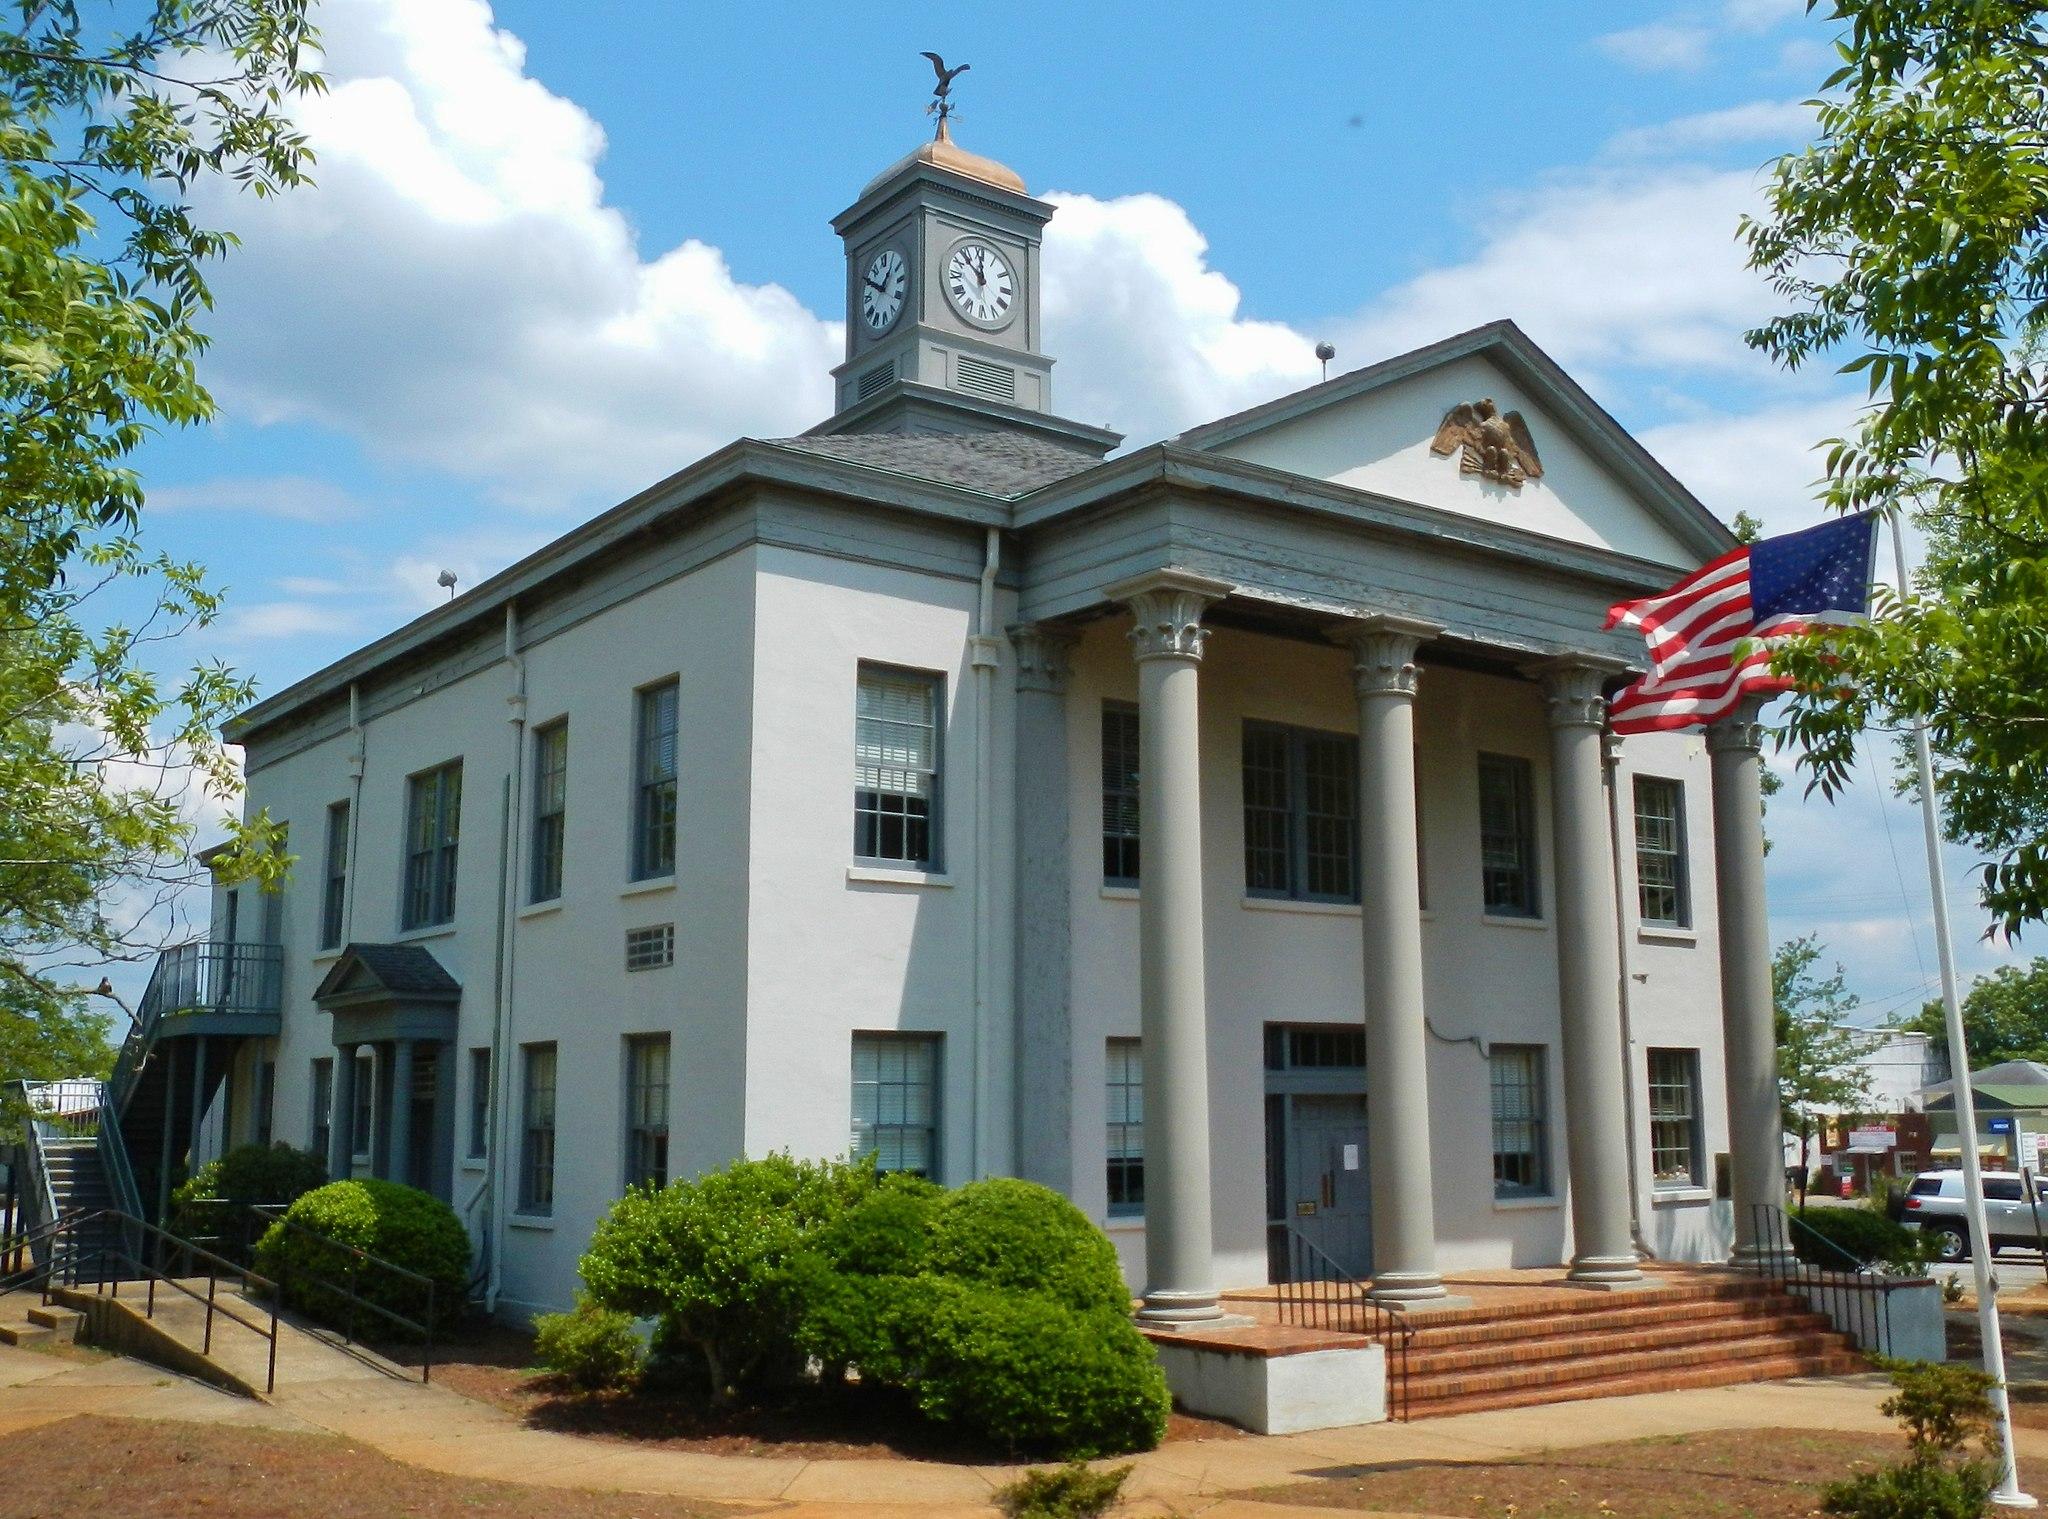 Marion County Courthouse (NRHP) Buena Vista, GA